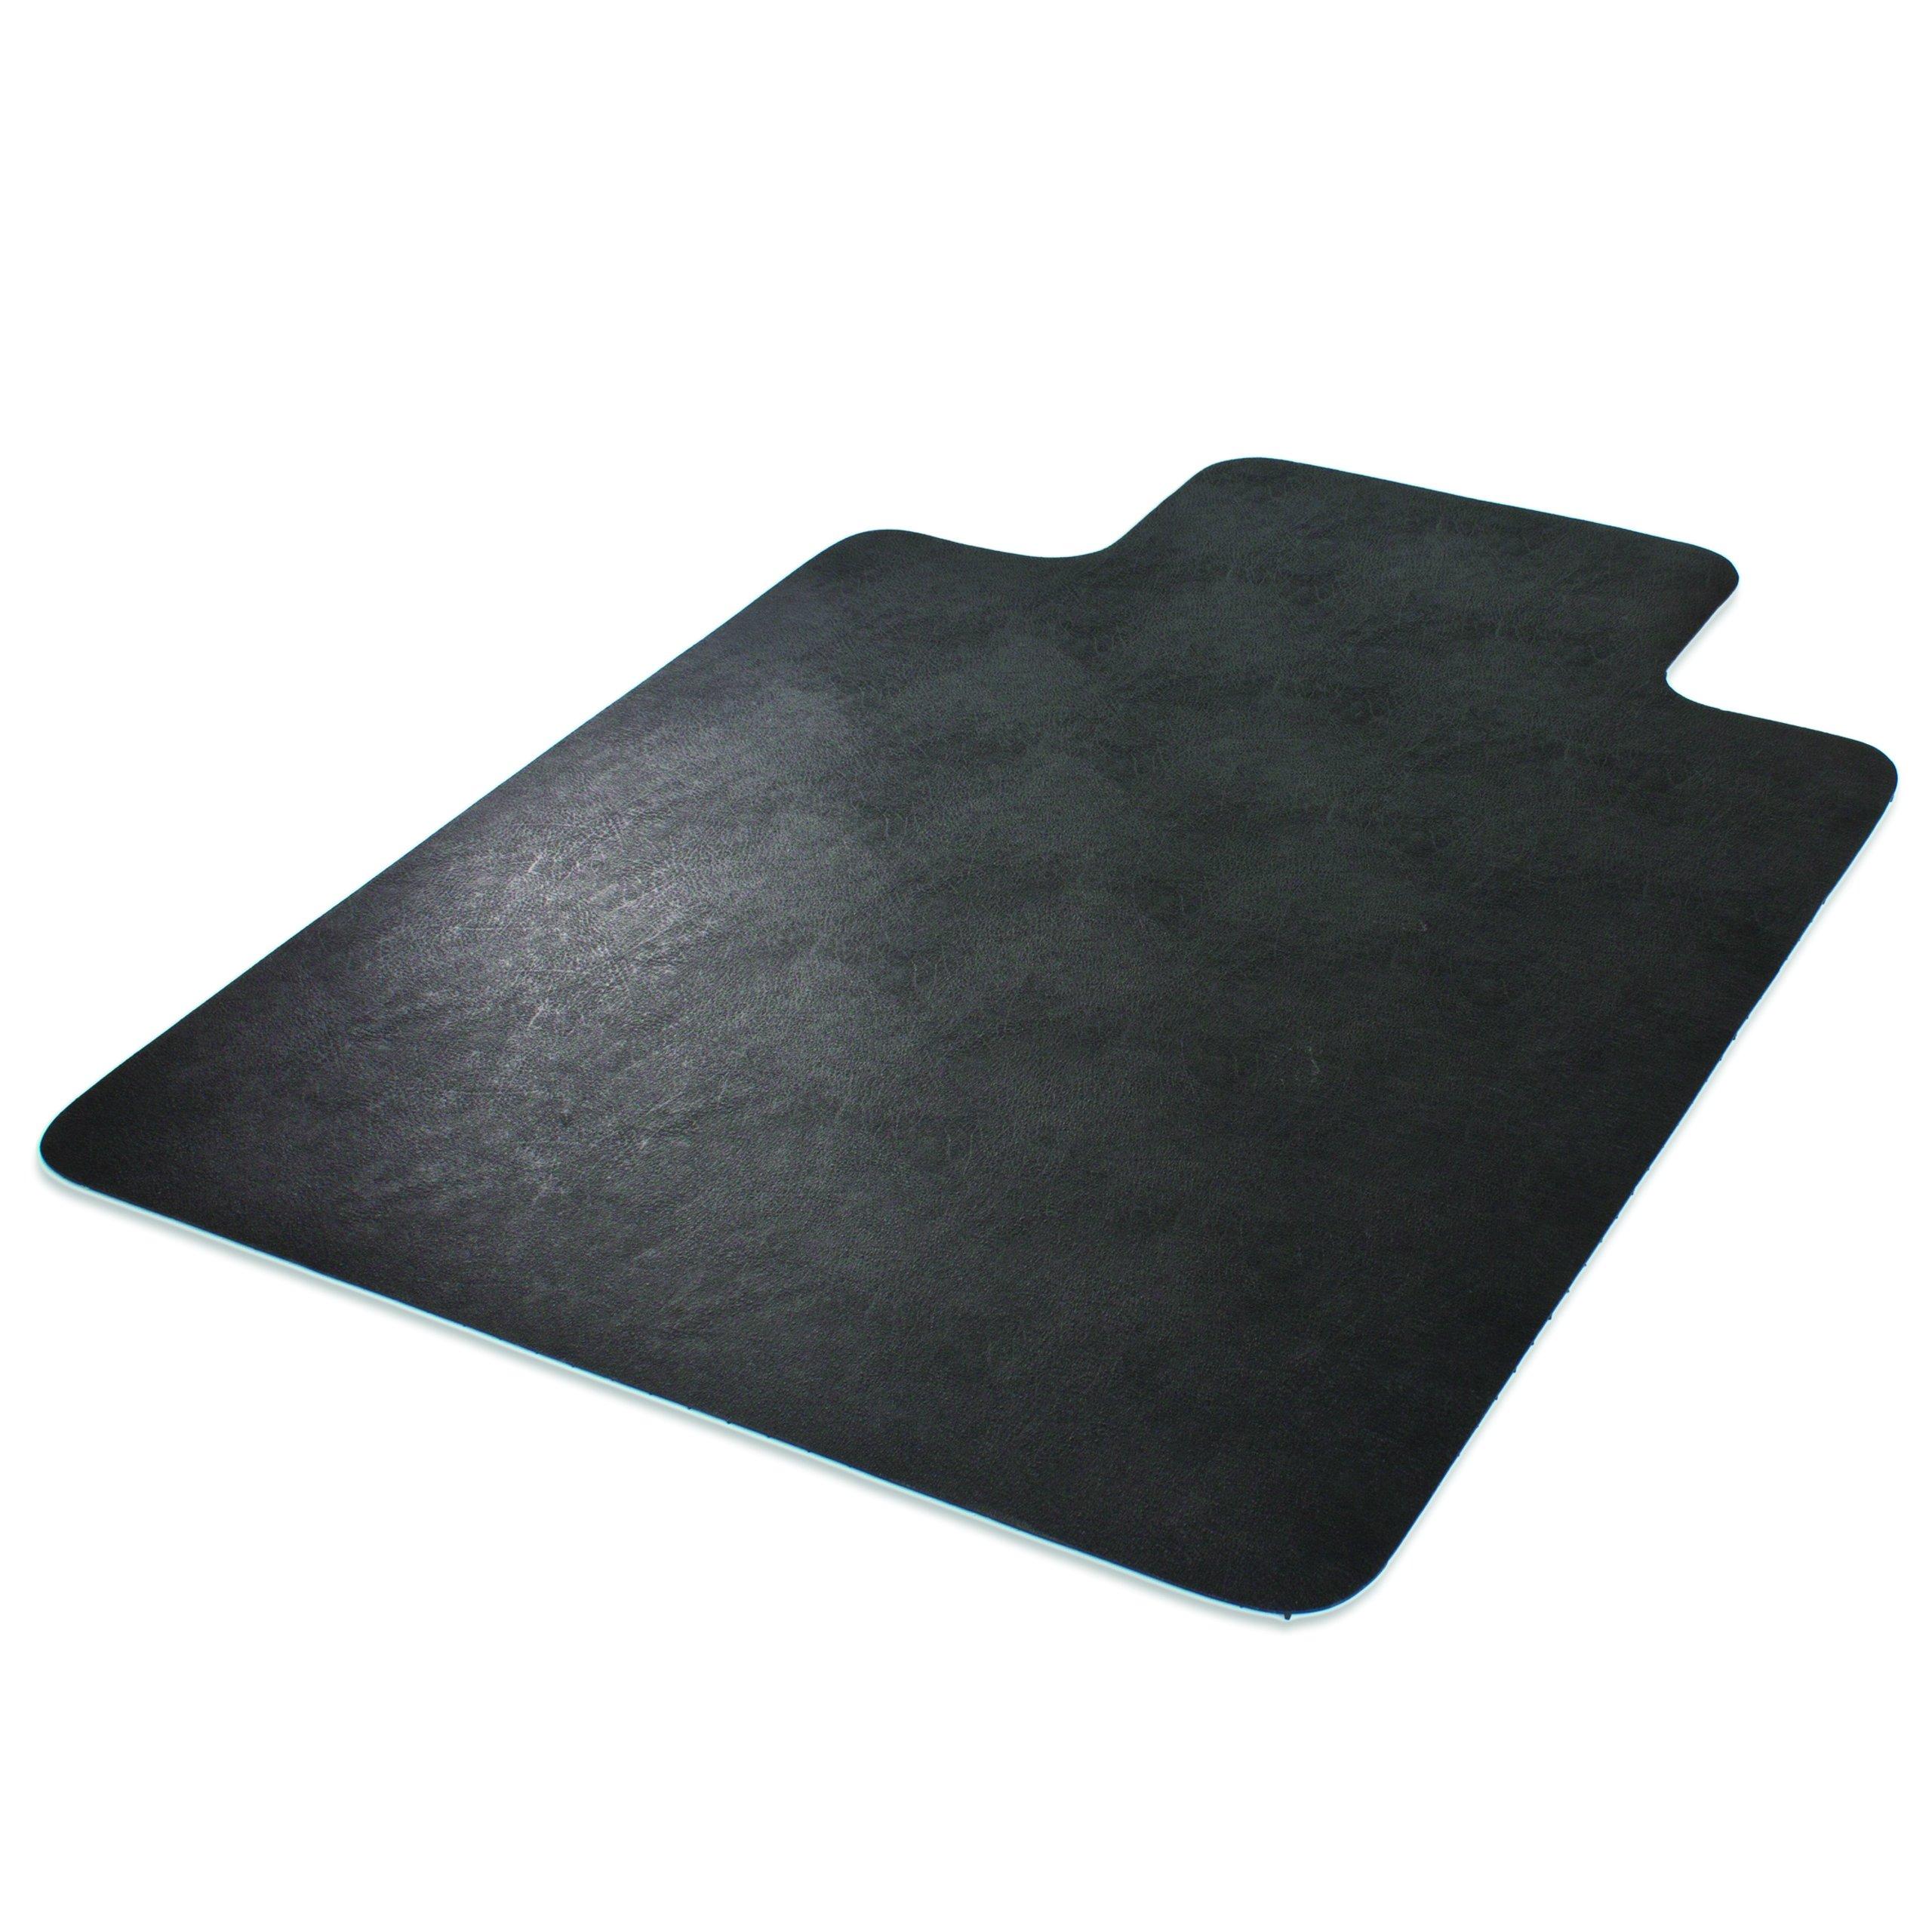 Deflecto EconoMat Chair Mat, Non-Studded for Hard Floors, Straight Edge, 45'' x 53'', Black (CM21232BLKCOM) by Deflecto